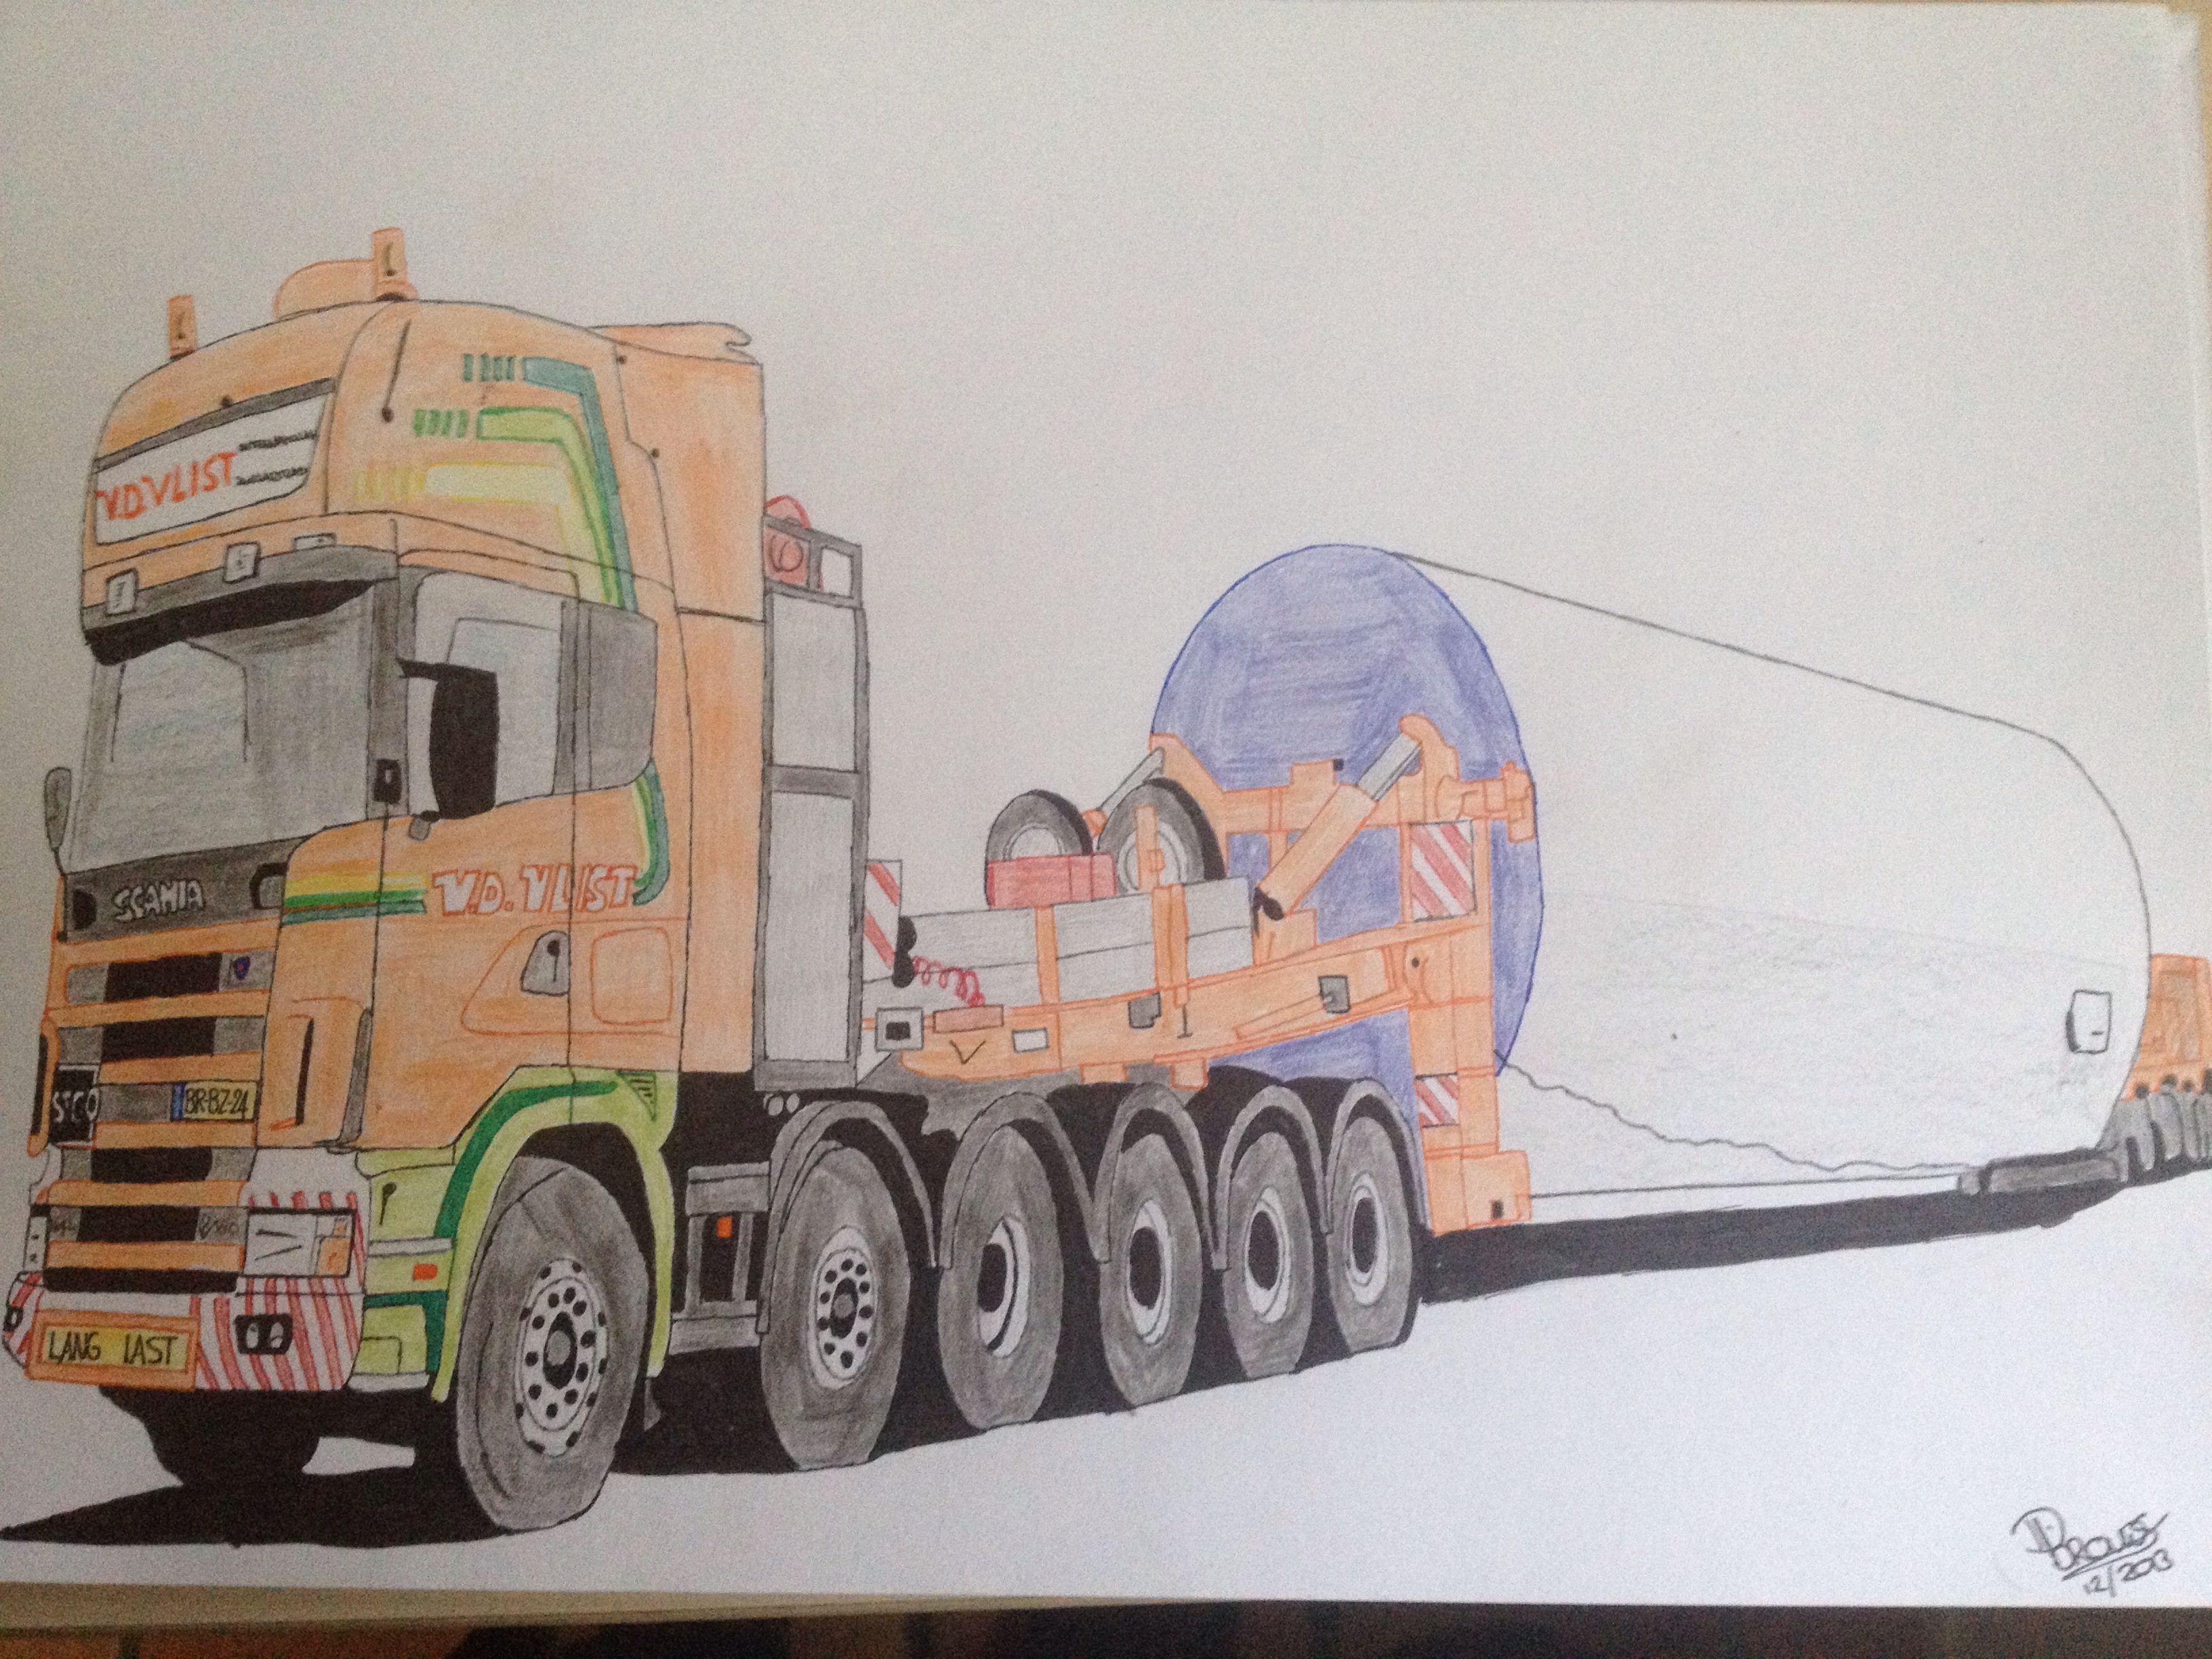 Scania Windmill Transport Vd Vlist